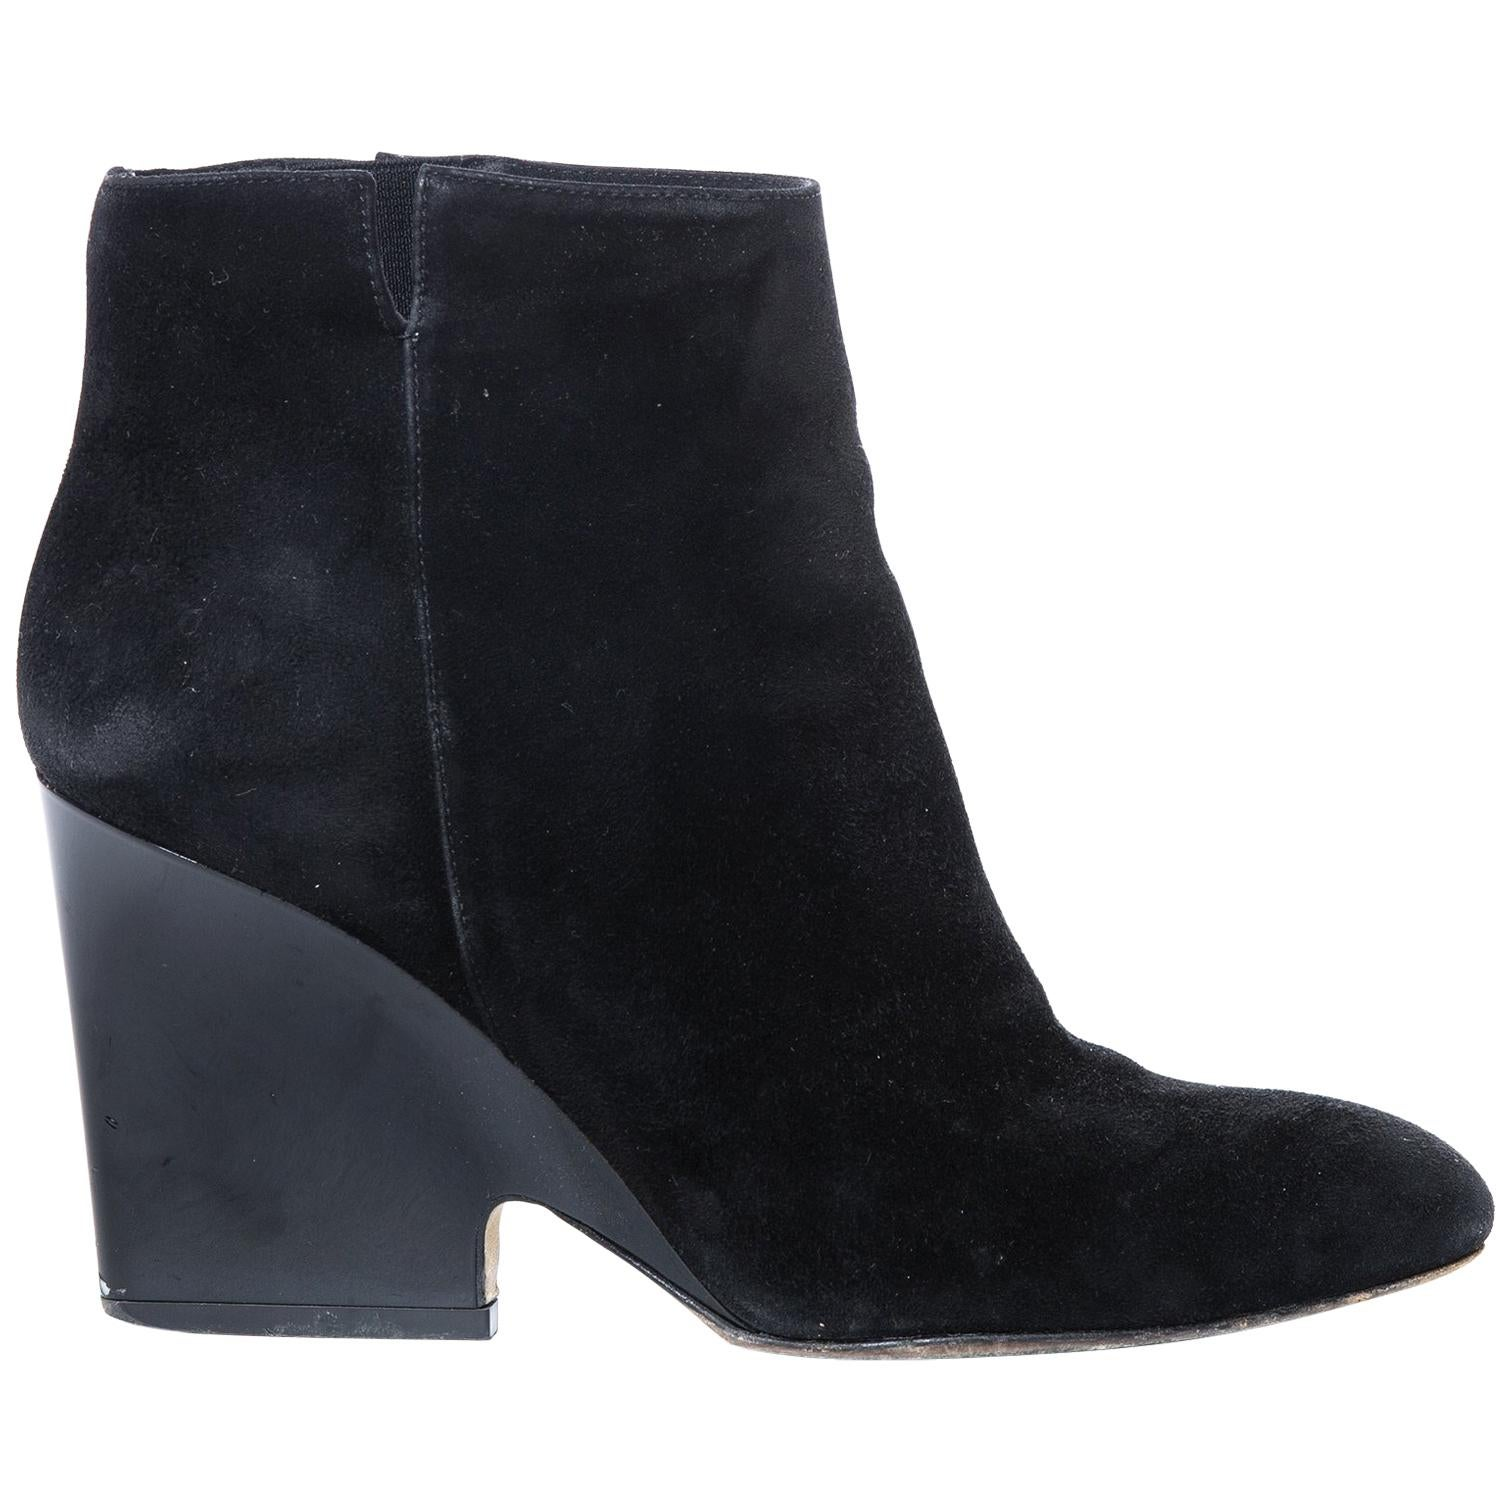 fe070e3948e7 Vintage Hermès Shoes - 21 For Sale at 1stdibs